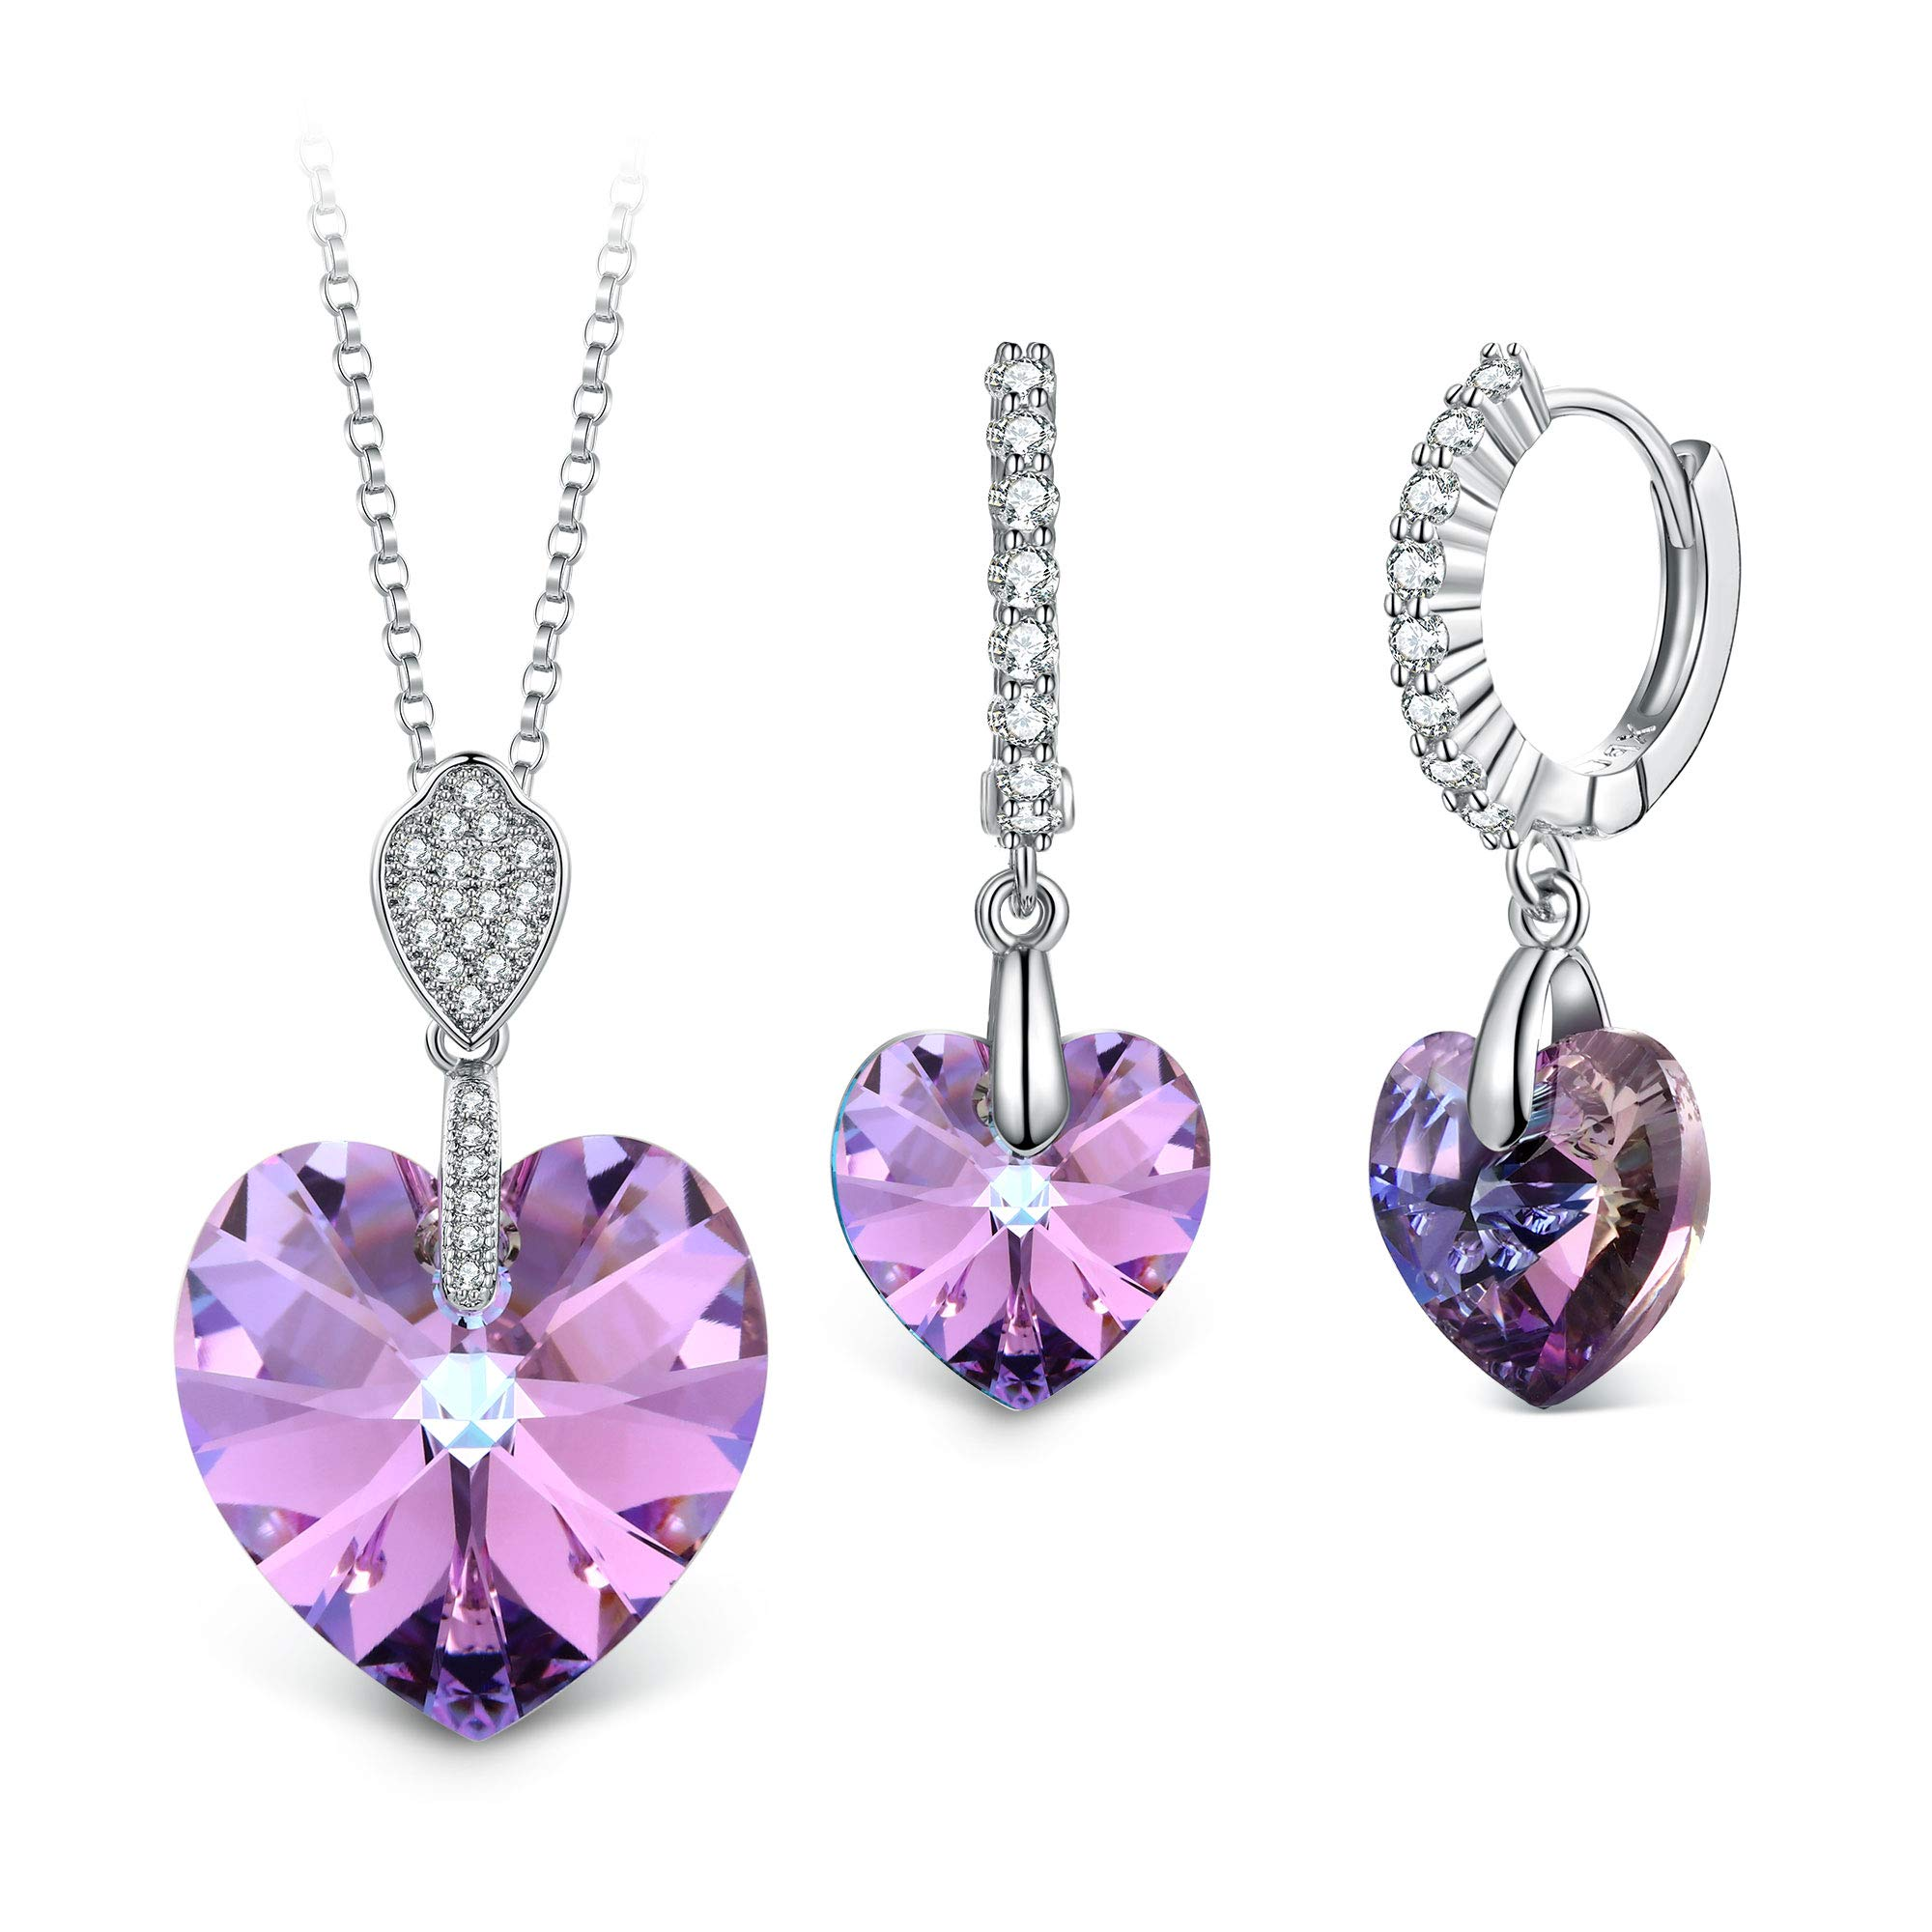 9daf2e93b22f T400 Jewelers